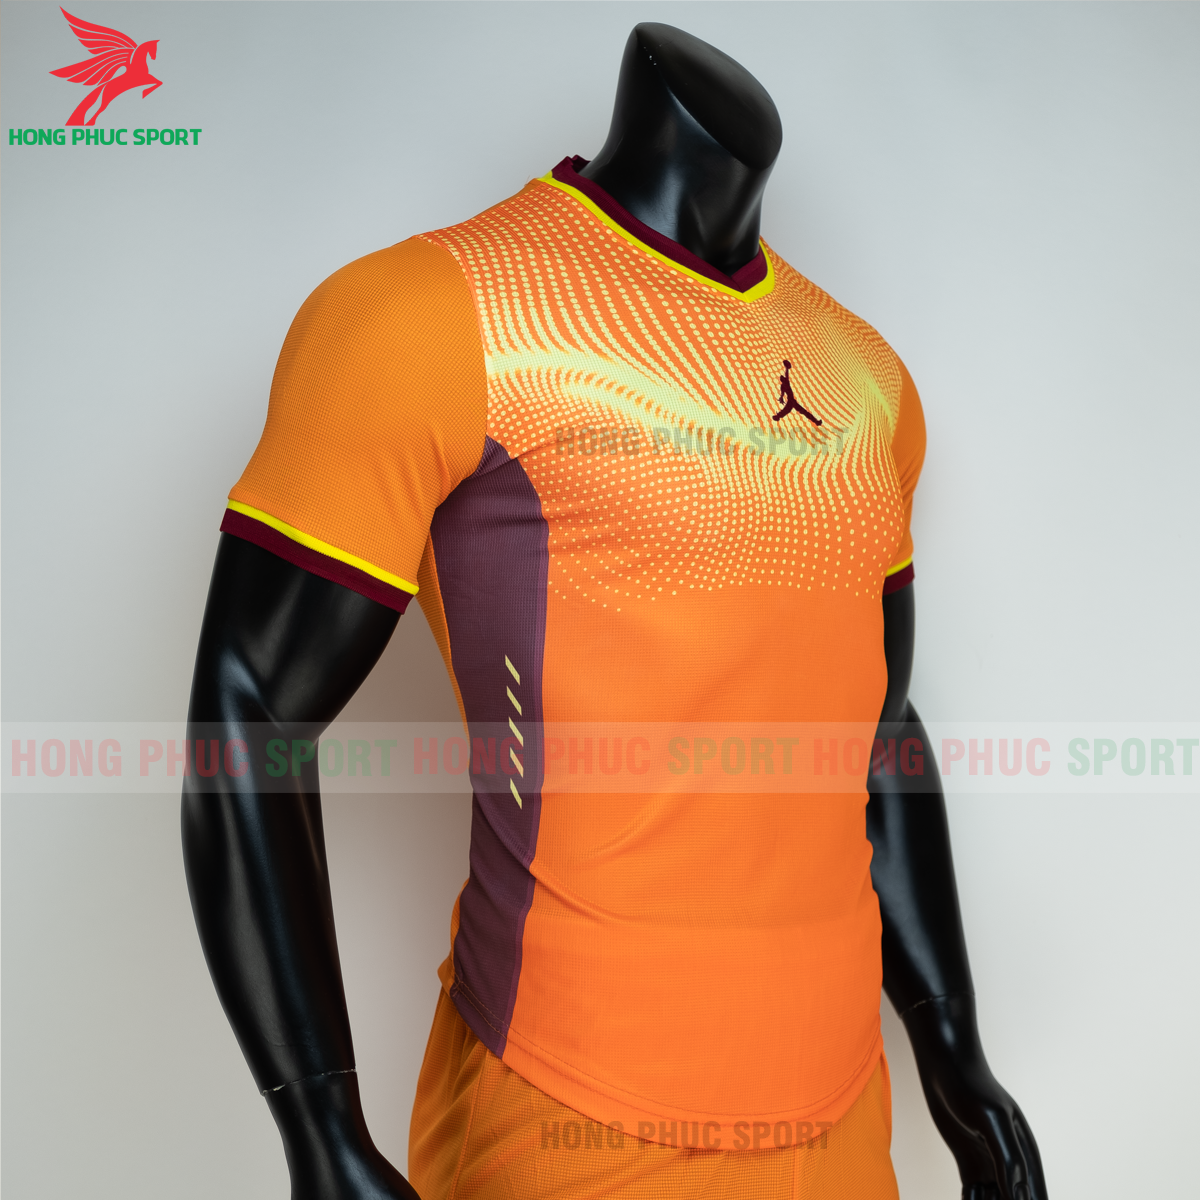 https://cdn.hongphucsport.com/unsafe/s4.shopbay.vn/files/285/ao-bong-chuyen-khong-logo-jordan-wave-mau-cam-5-60501f343fbe7.png